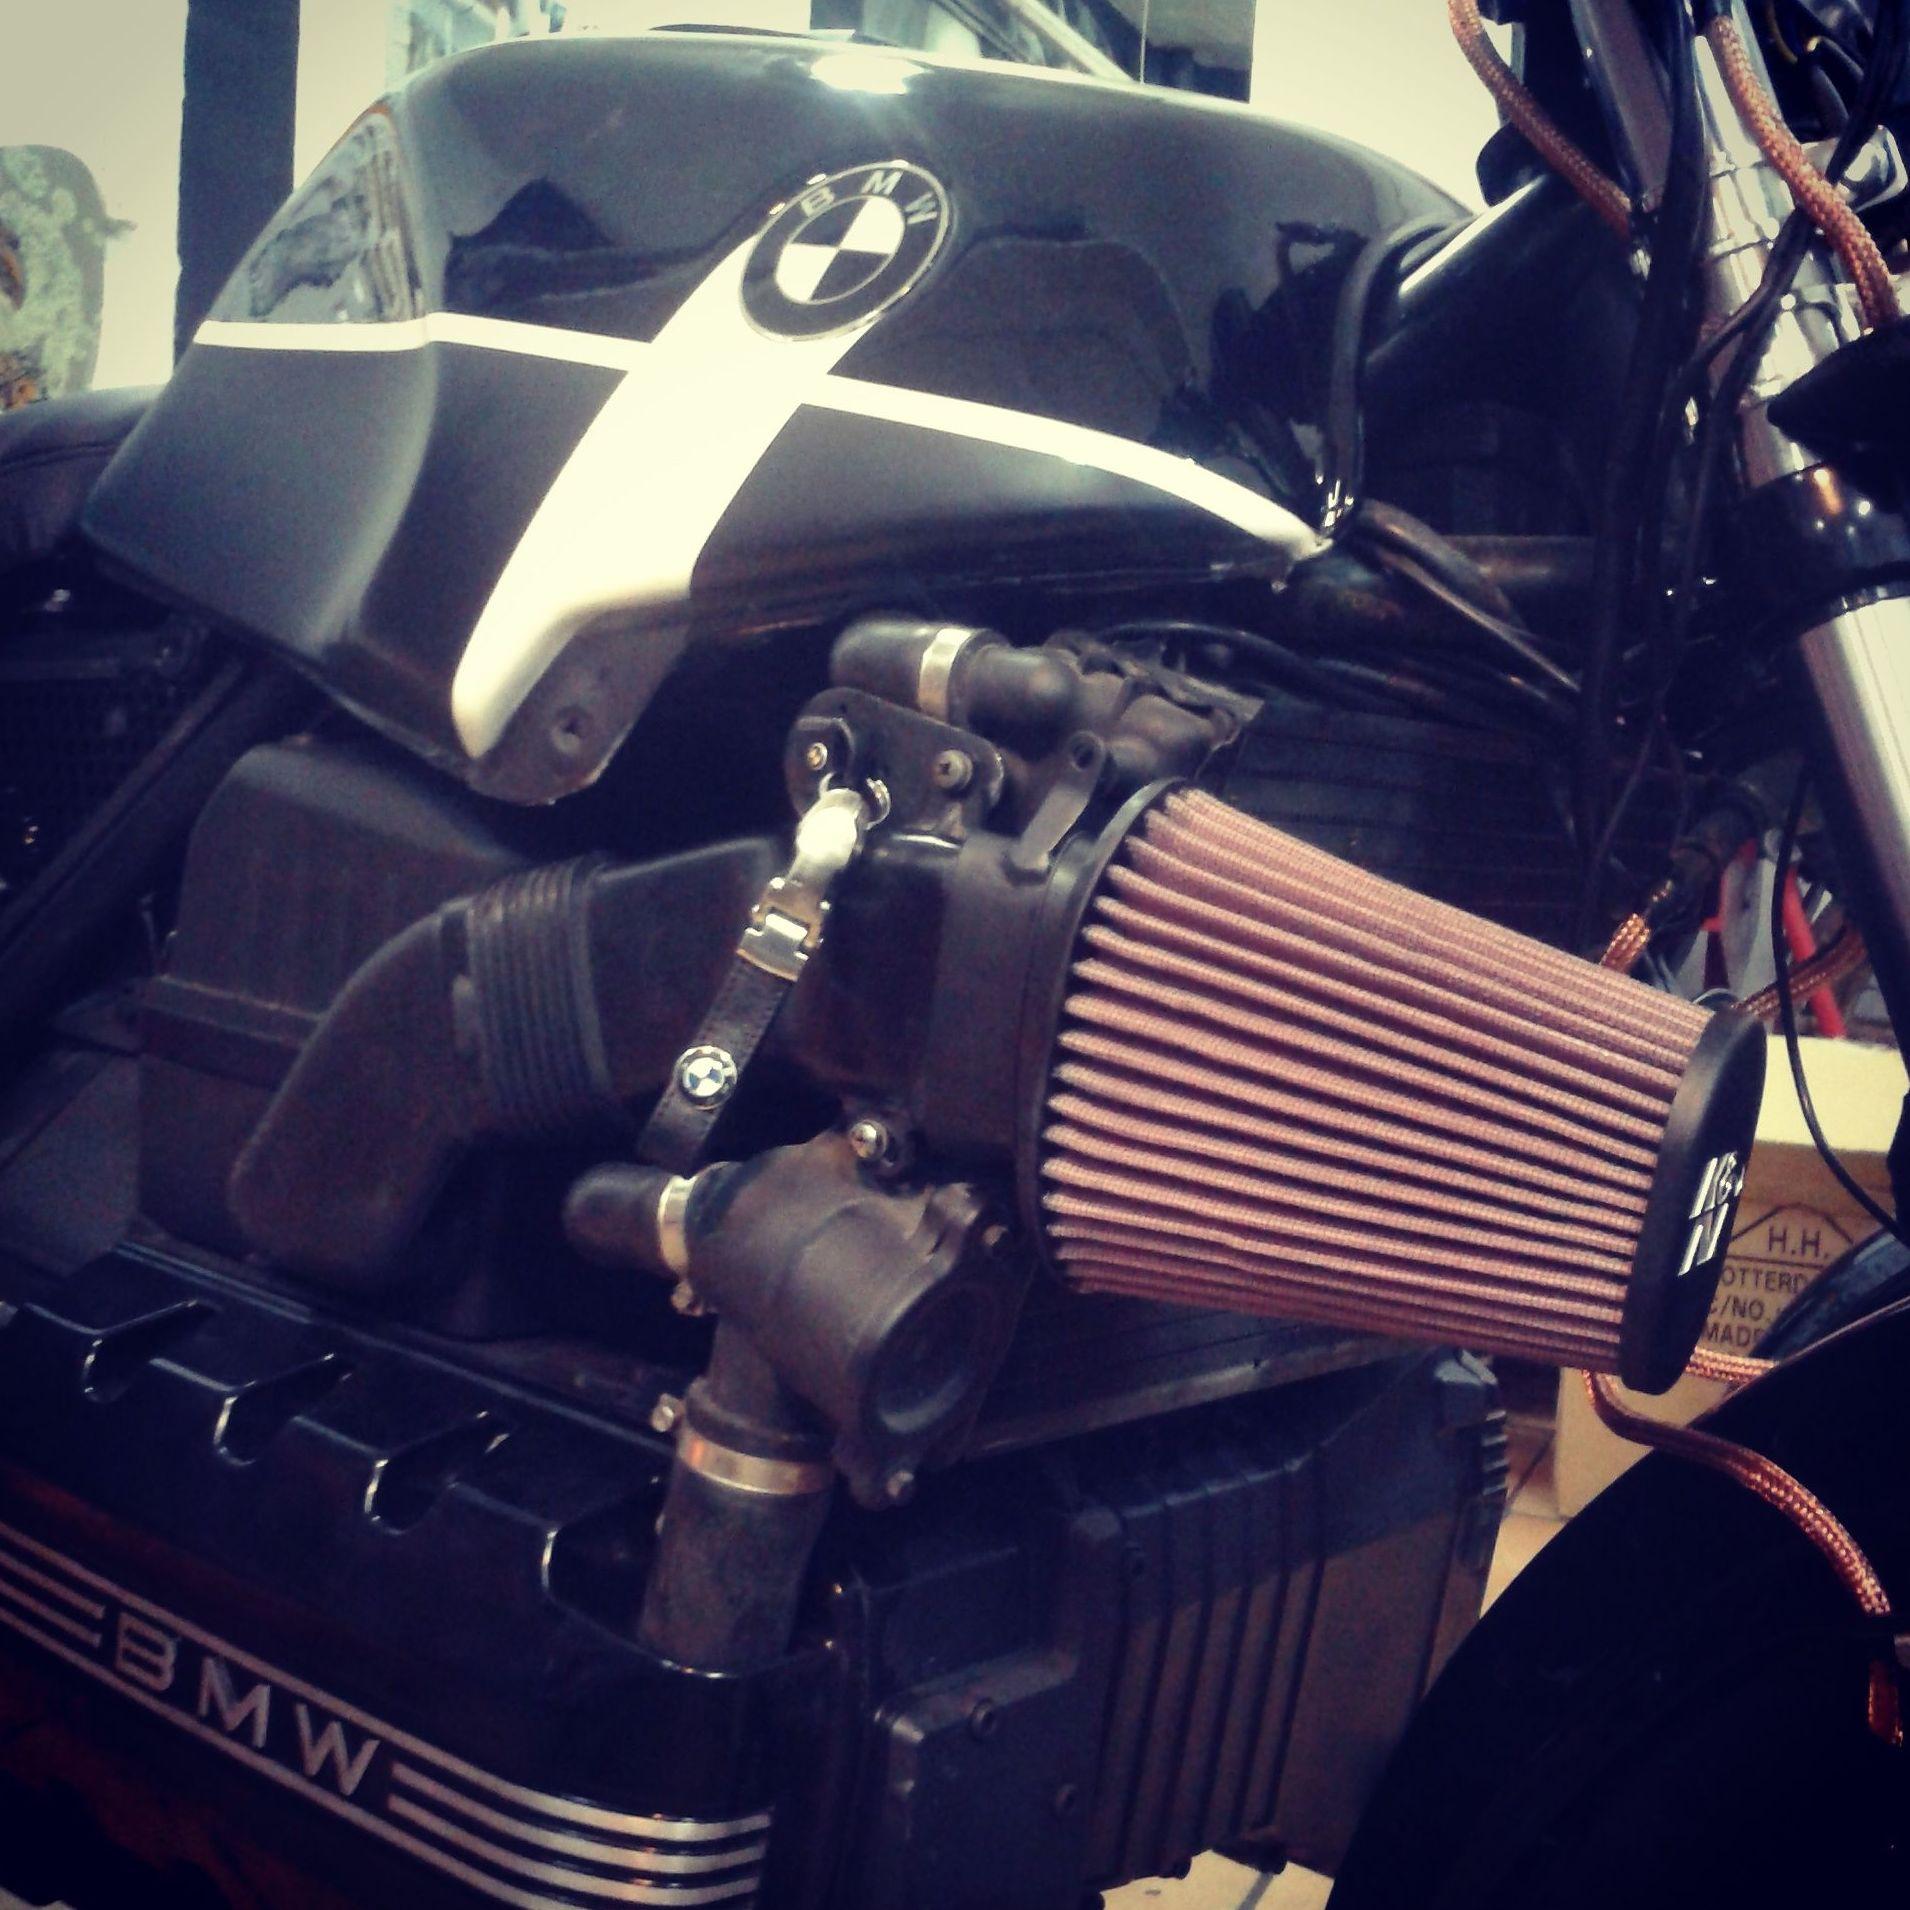 motos custom en valencia, personalizacion motos, customizar bmw, bmwk100